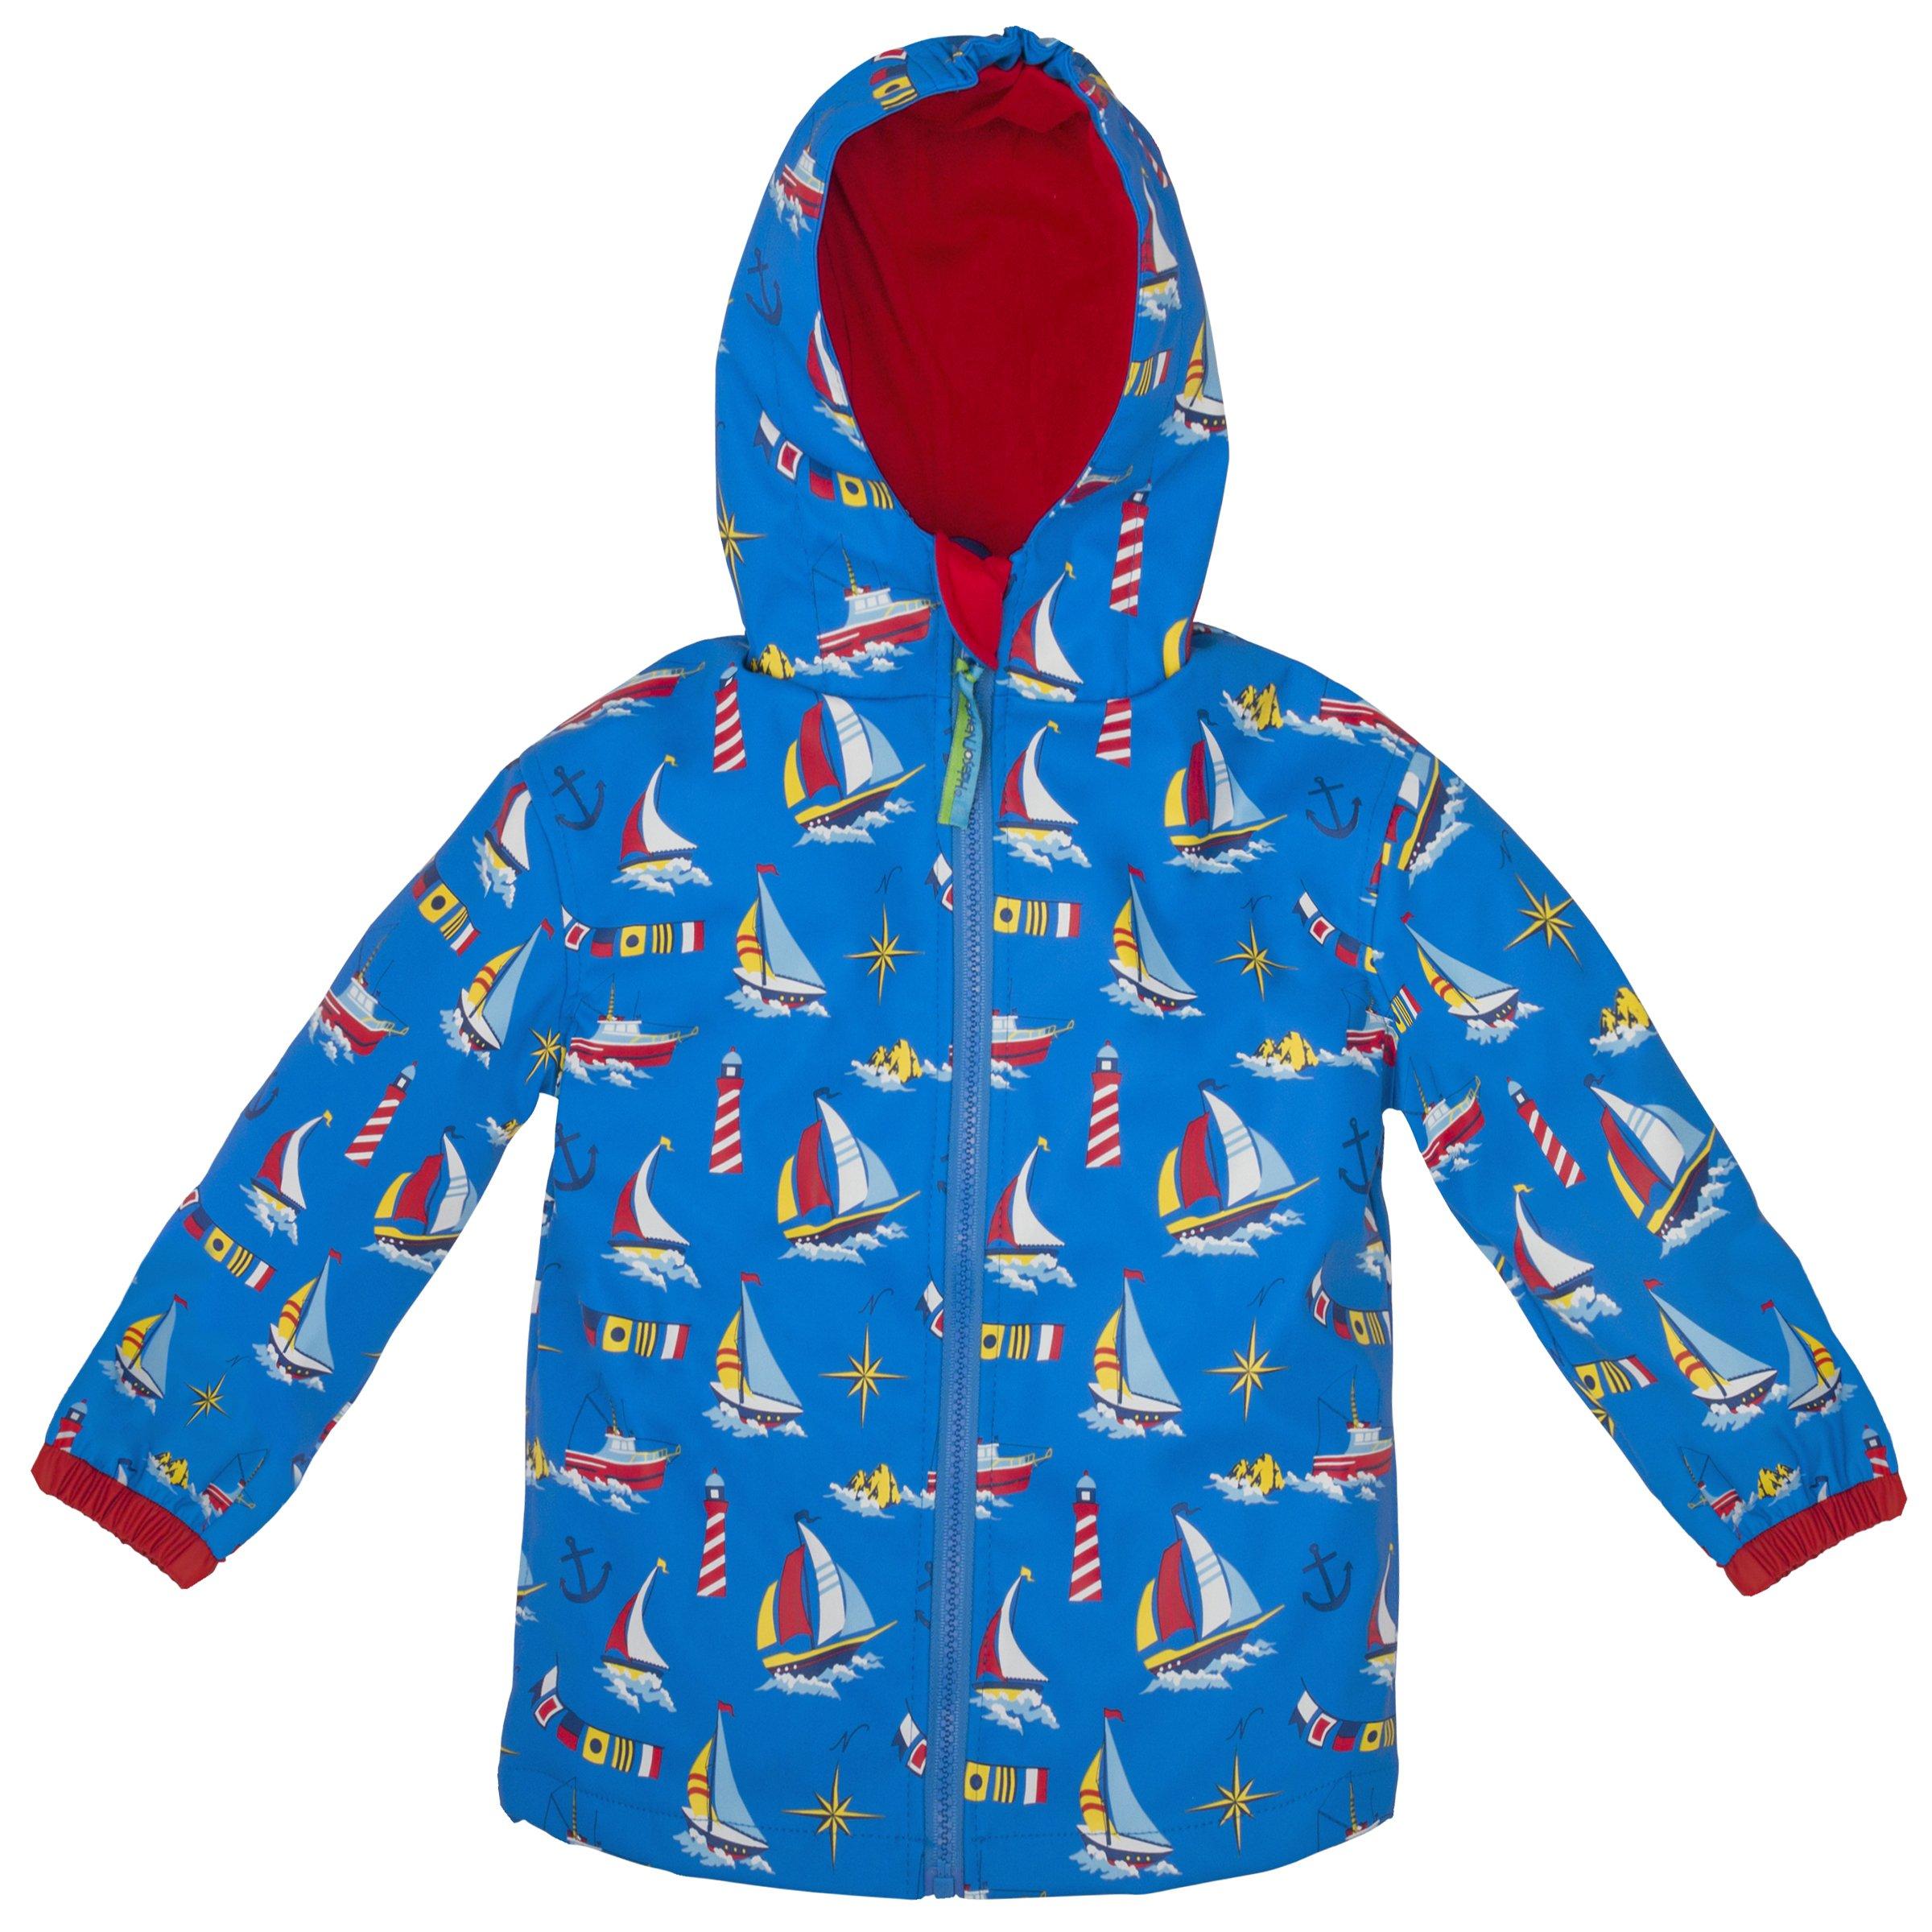 Stephen Joseph Boys' All Over Print Raincoat, Nautical, 4/5